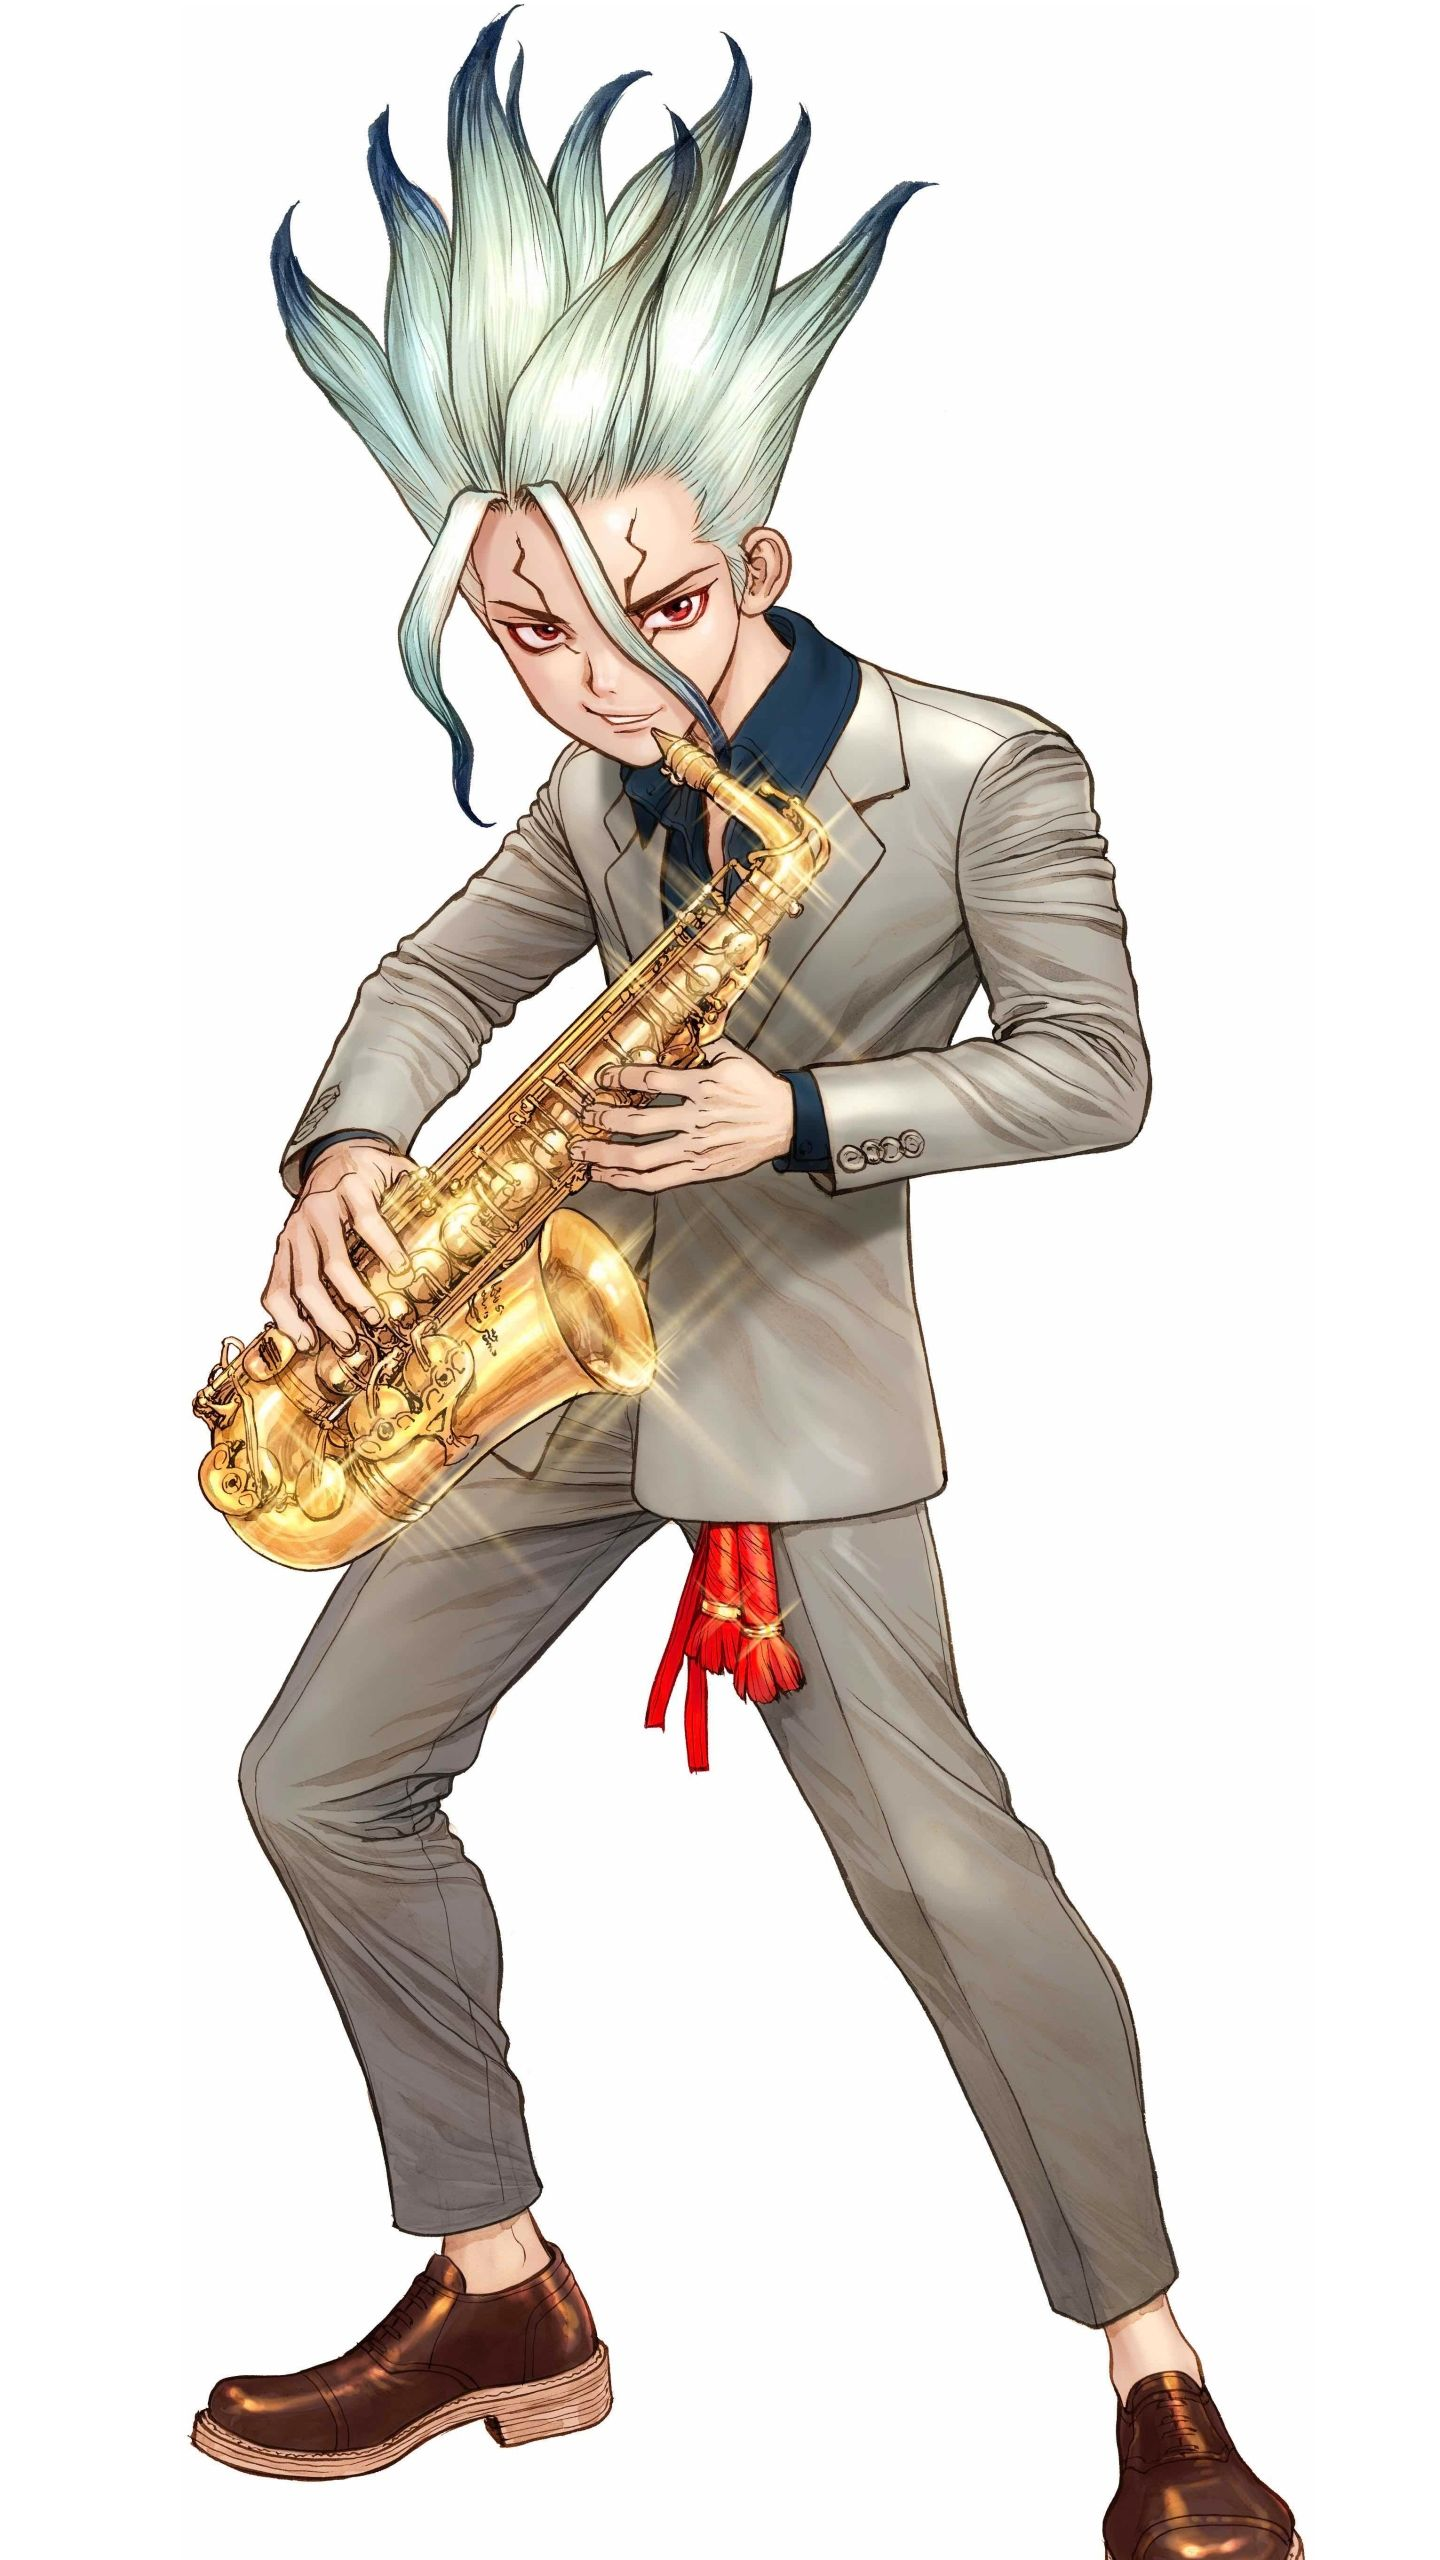 Dr. Stone is anime premiered on Summer 2019 based on manga